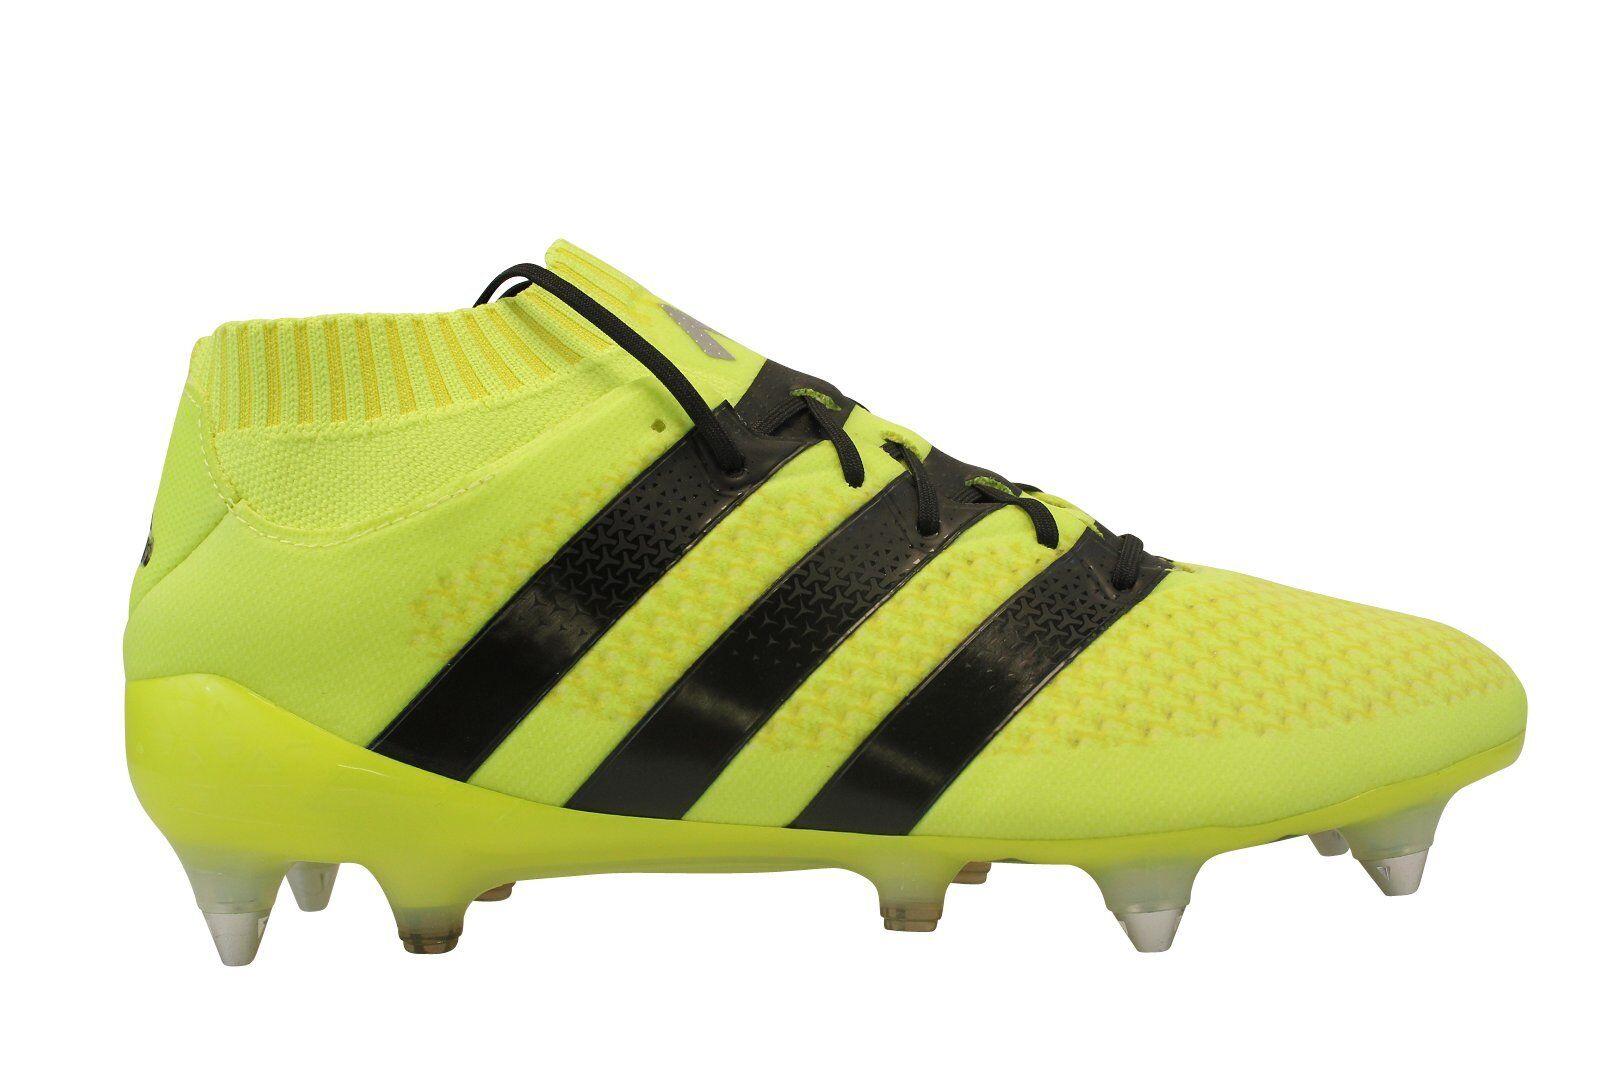 ADIDAS ACE 16.1 PRIMEKNIT SOFT SG FOOTBALL BOOTS YELLOW SIZE AQ3458 NEW